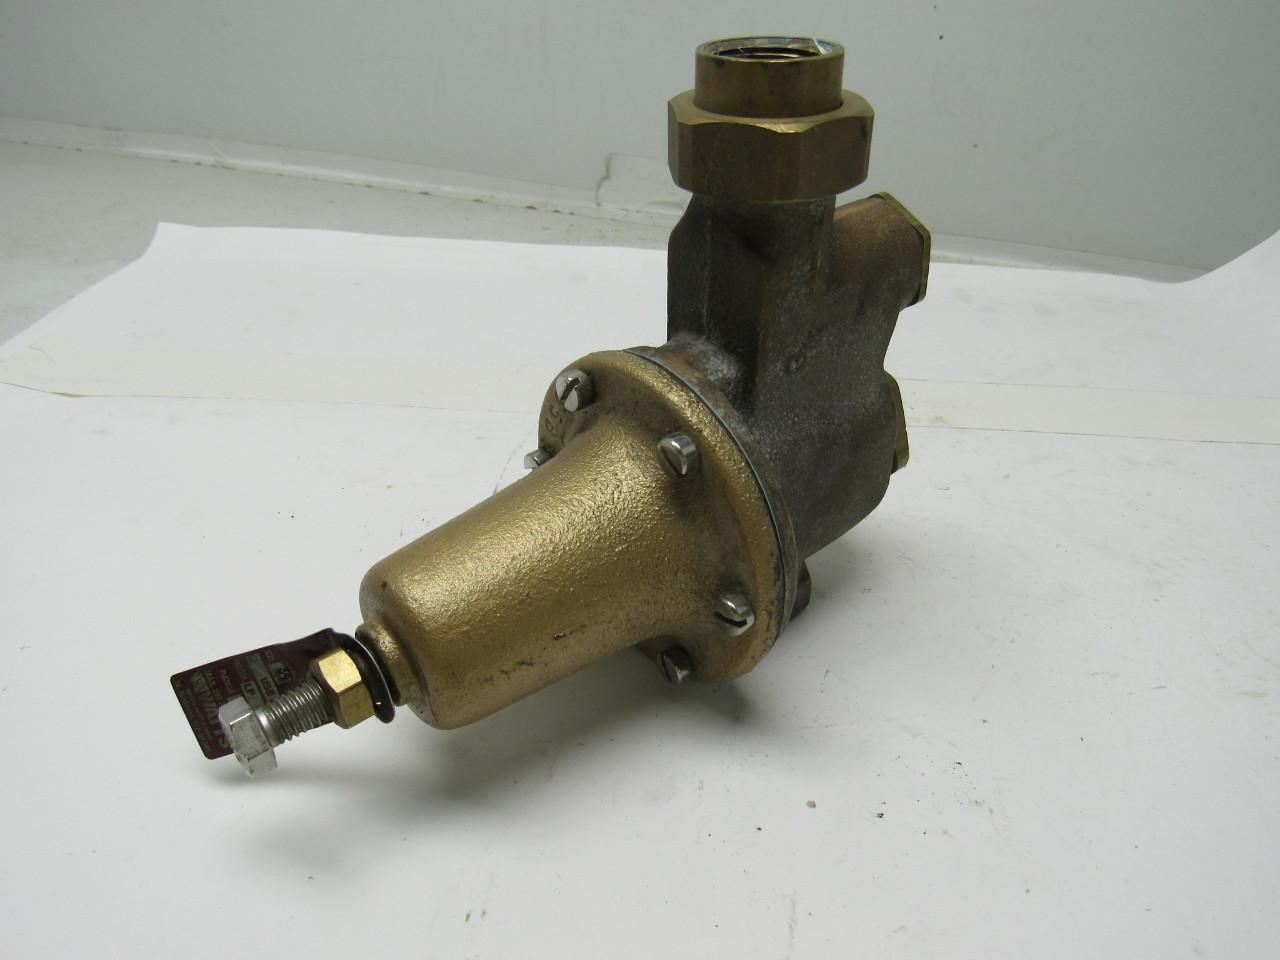 watts u5b z3 lp water pressure reducing valve 10 35 psi ebay. Black Bedroom Furniture Sets. Home Design Ideas